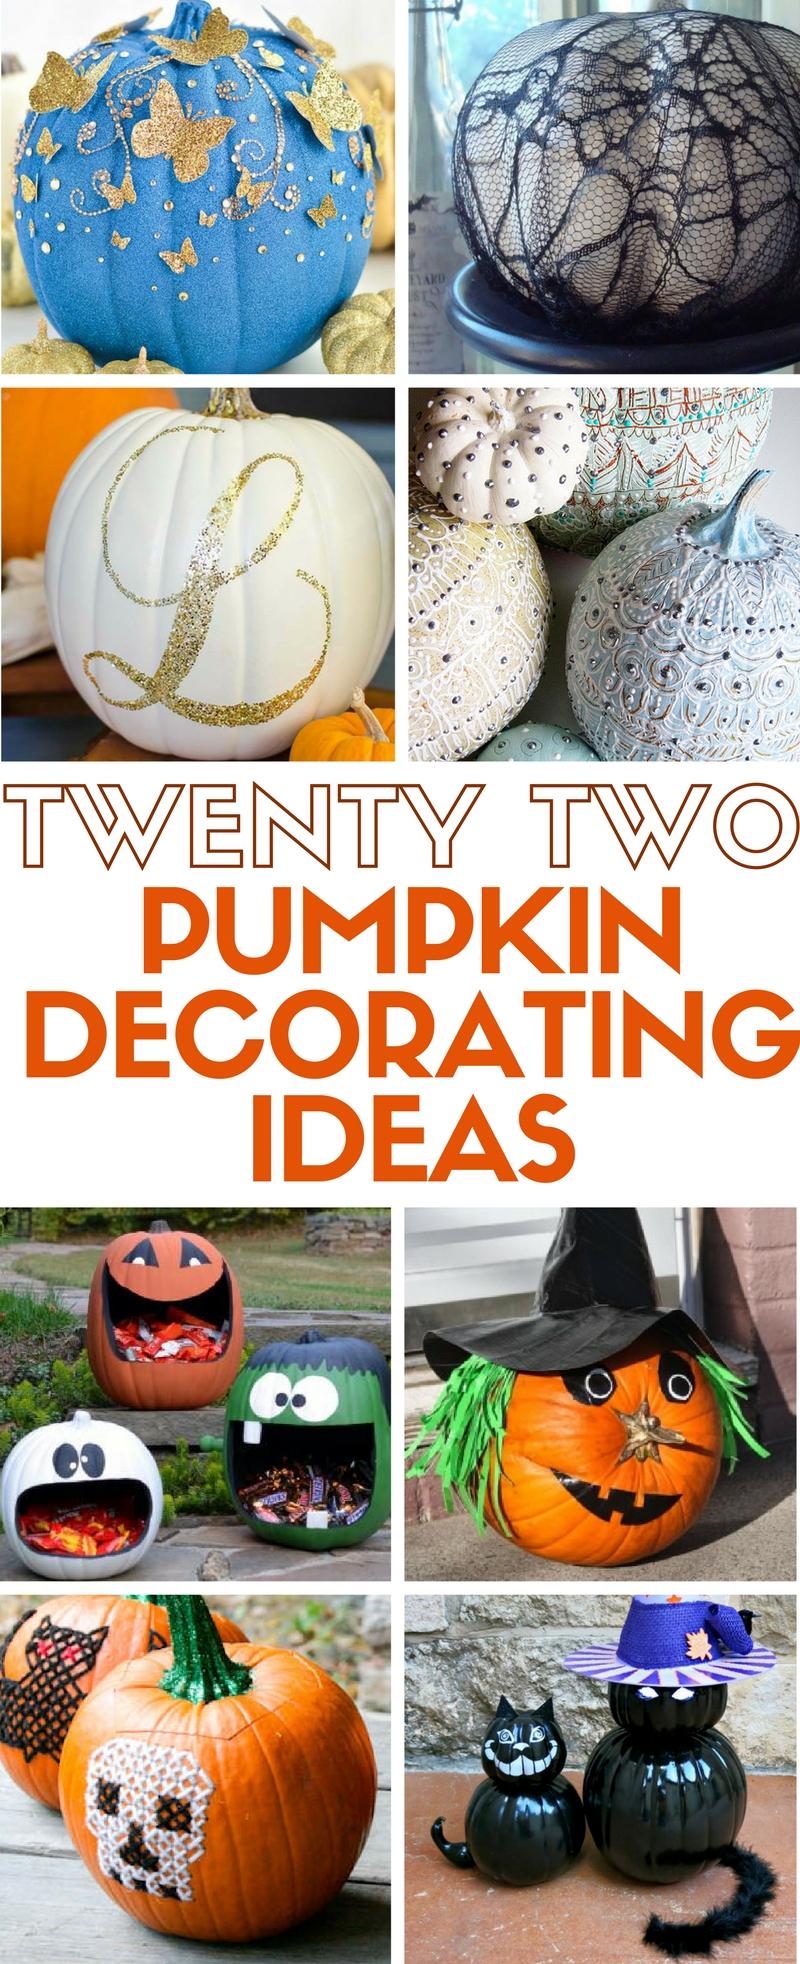 22 Pumpkin Decorating Ideas | The Crafty Blog Stalker